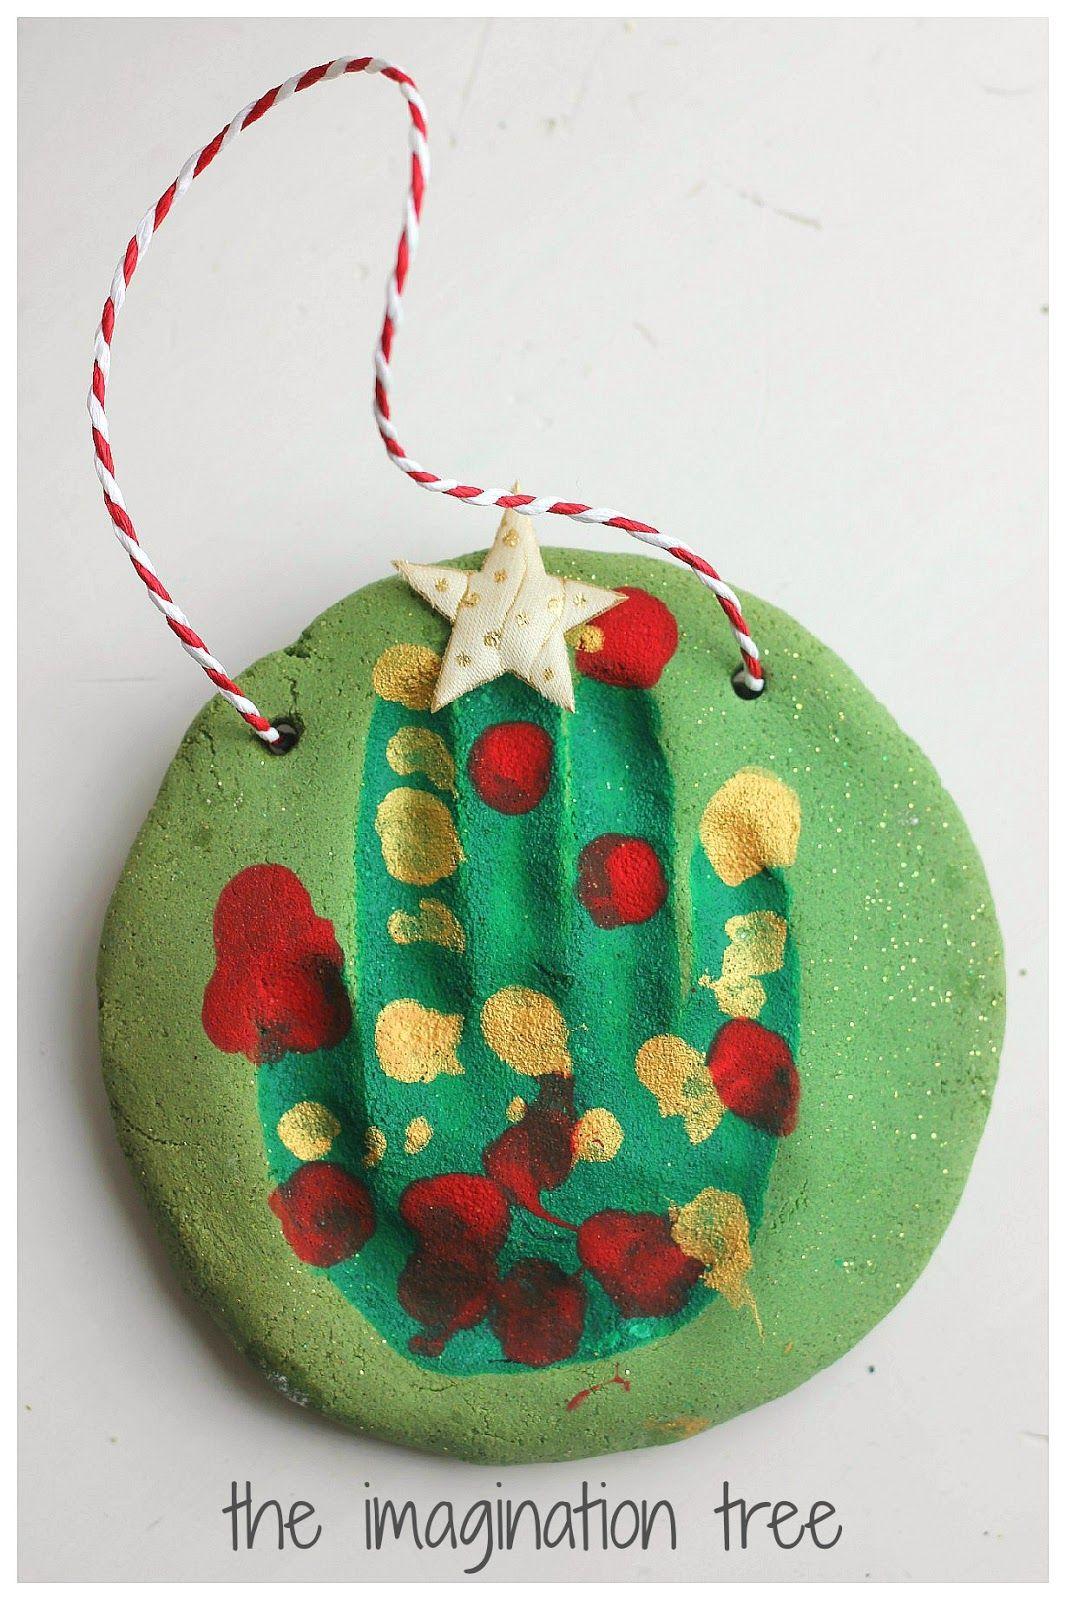 Salt Dough Handprint Christmas Tree Ornaments The Imagination Tree Handprint Christmas Christmas Gifts For Parents Handprint Christmas Tree